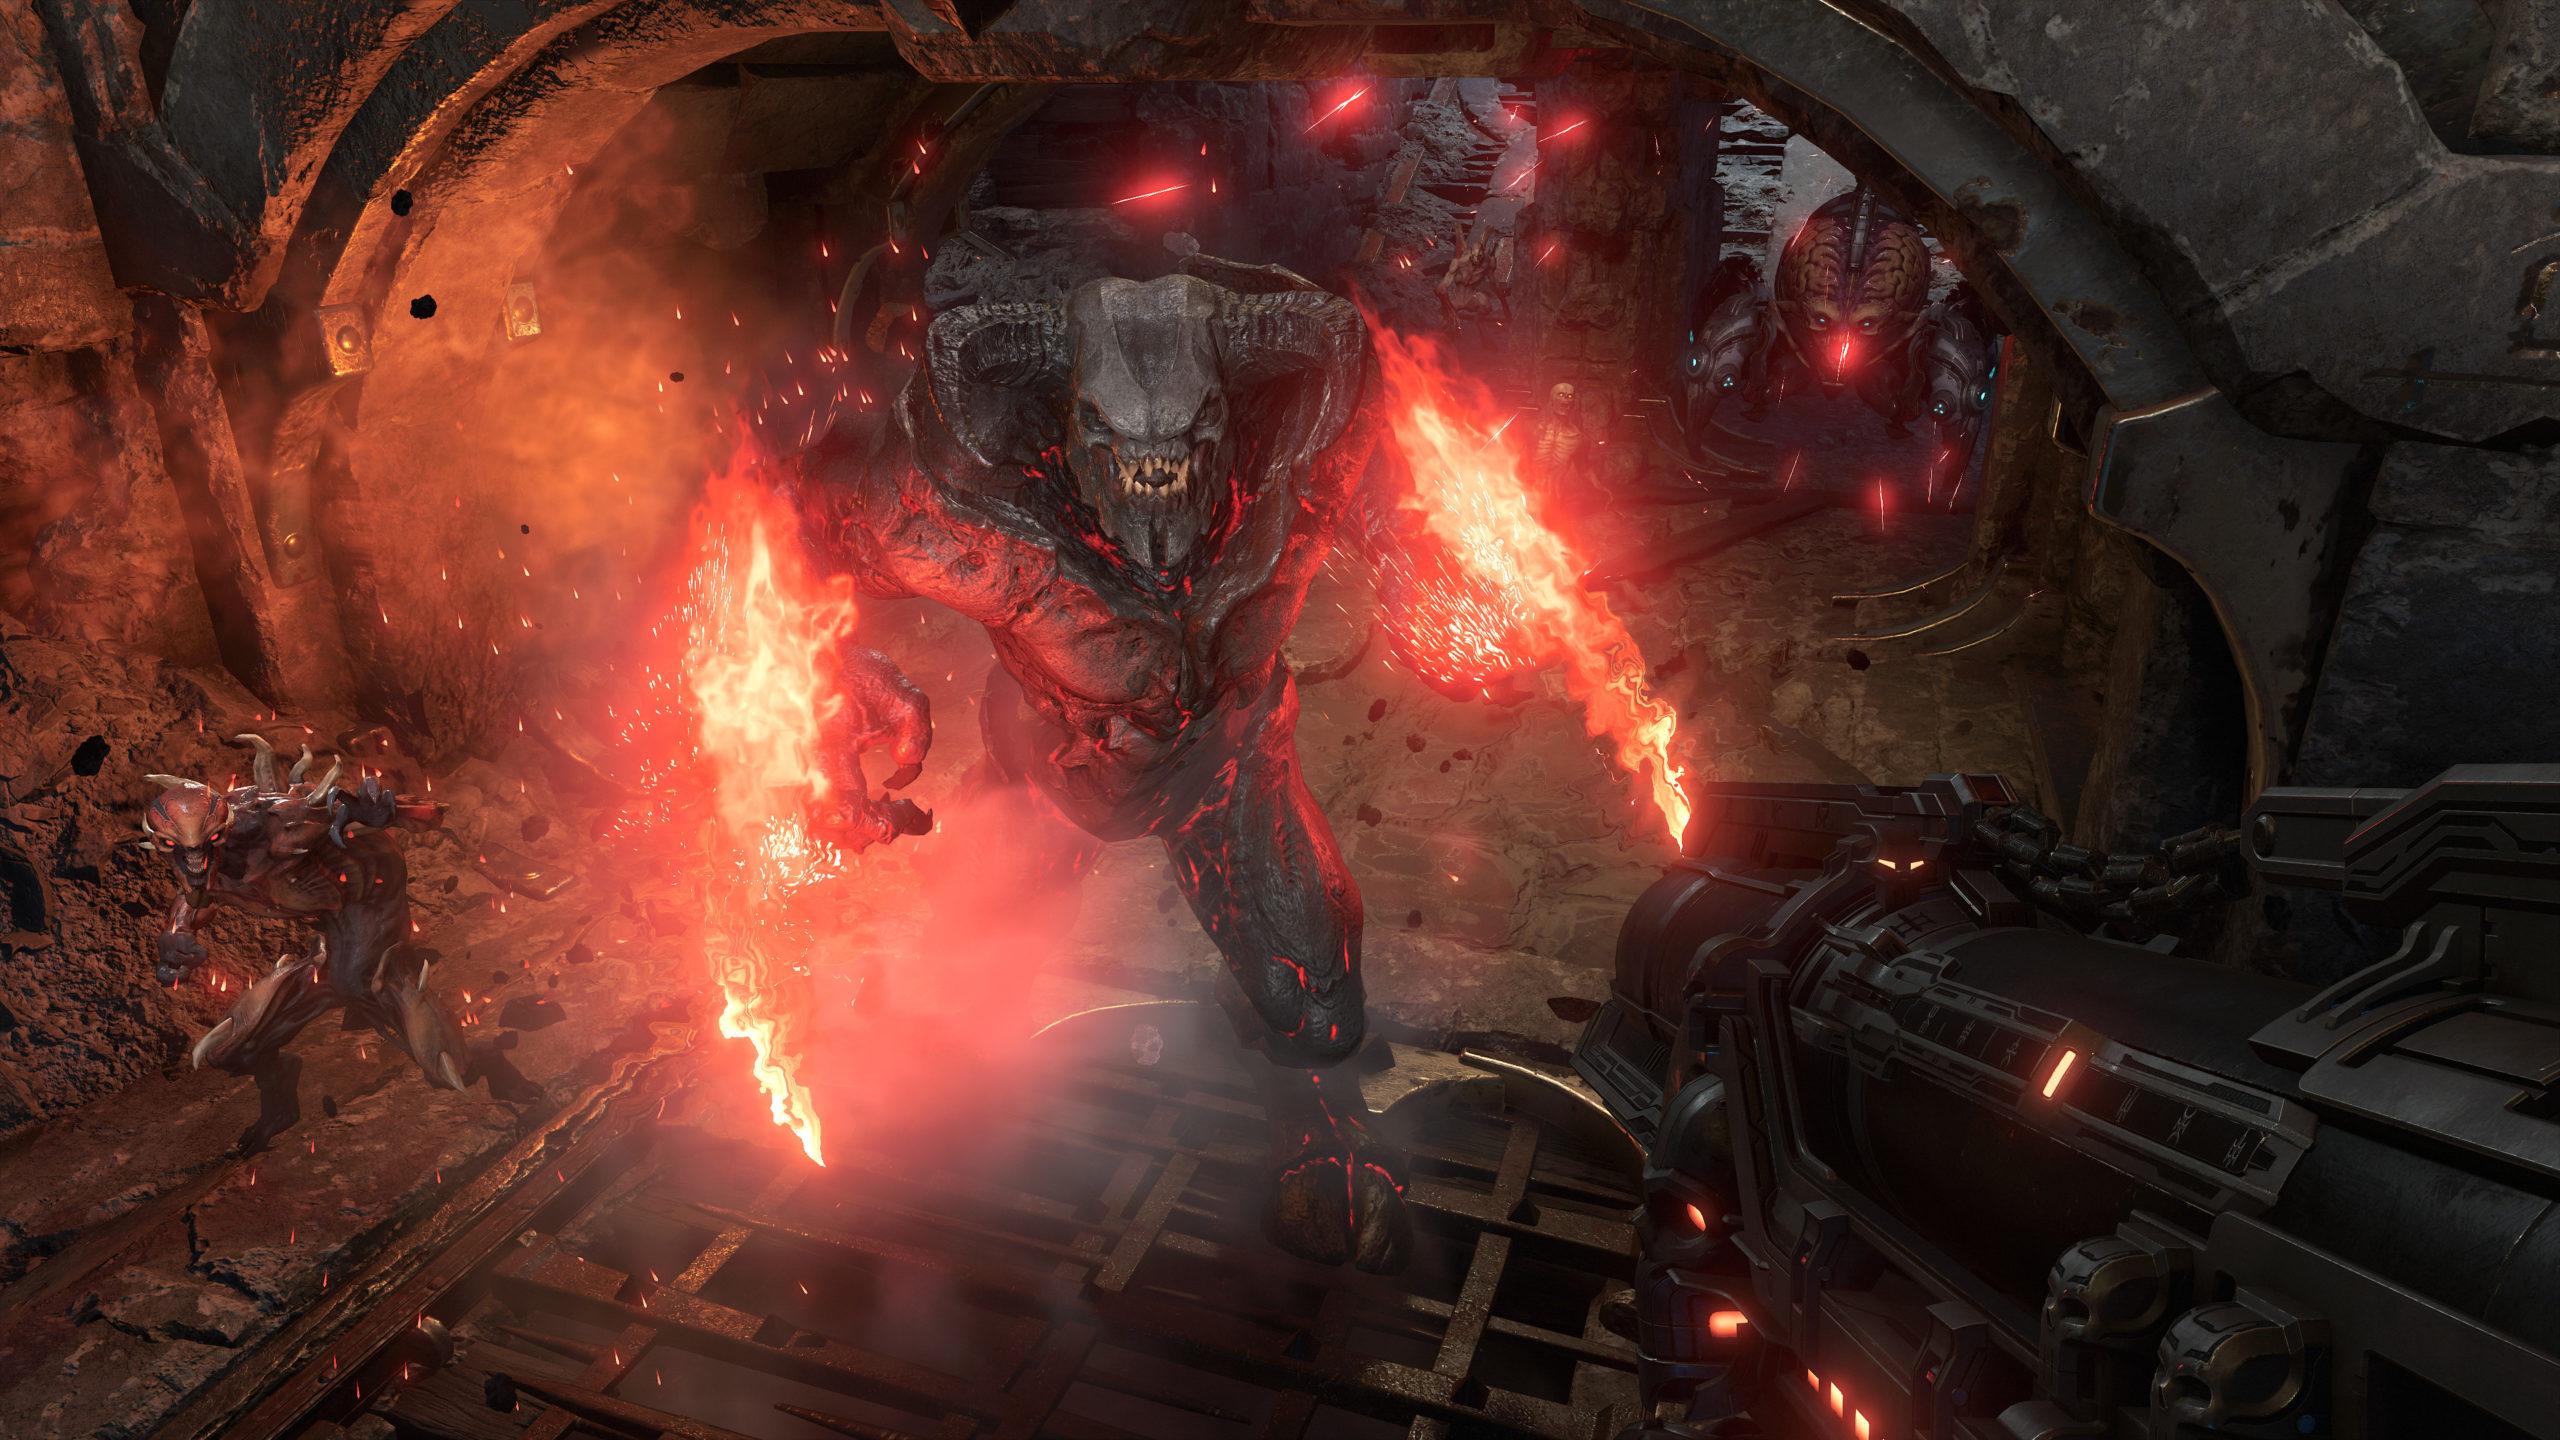 Doom Eternal Director Says He Already Has Ideas For The Future Vgc